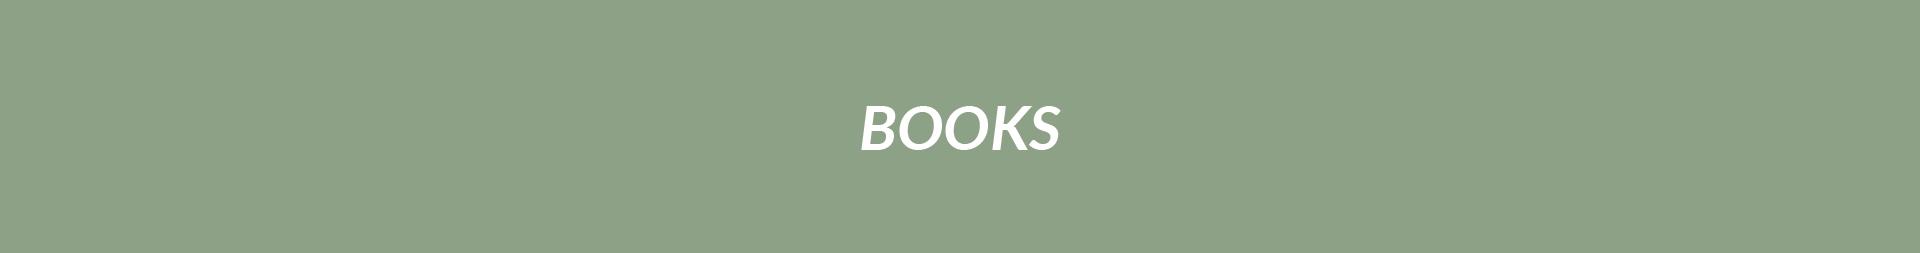 Books 01 01